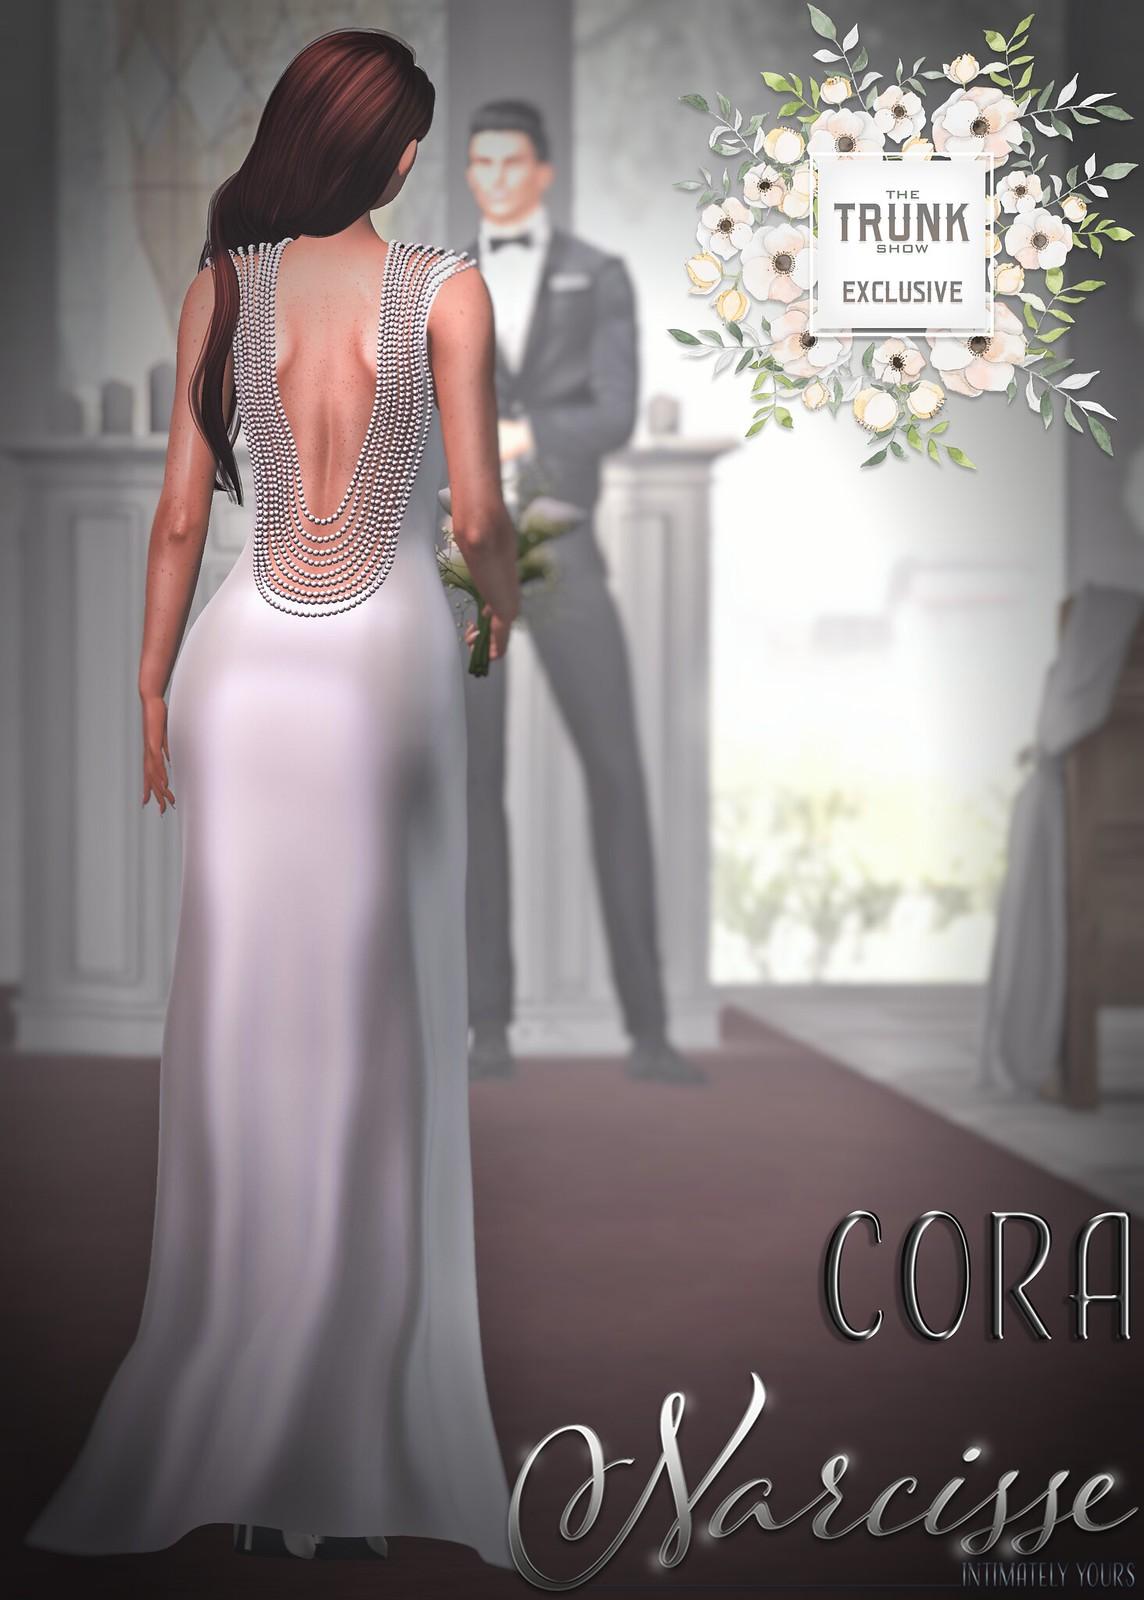 Cora (Back view)